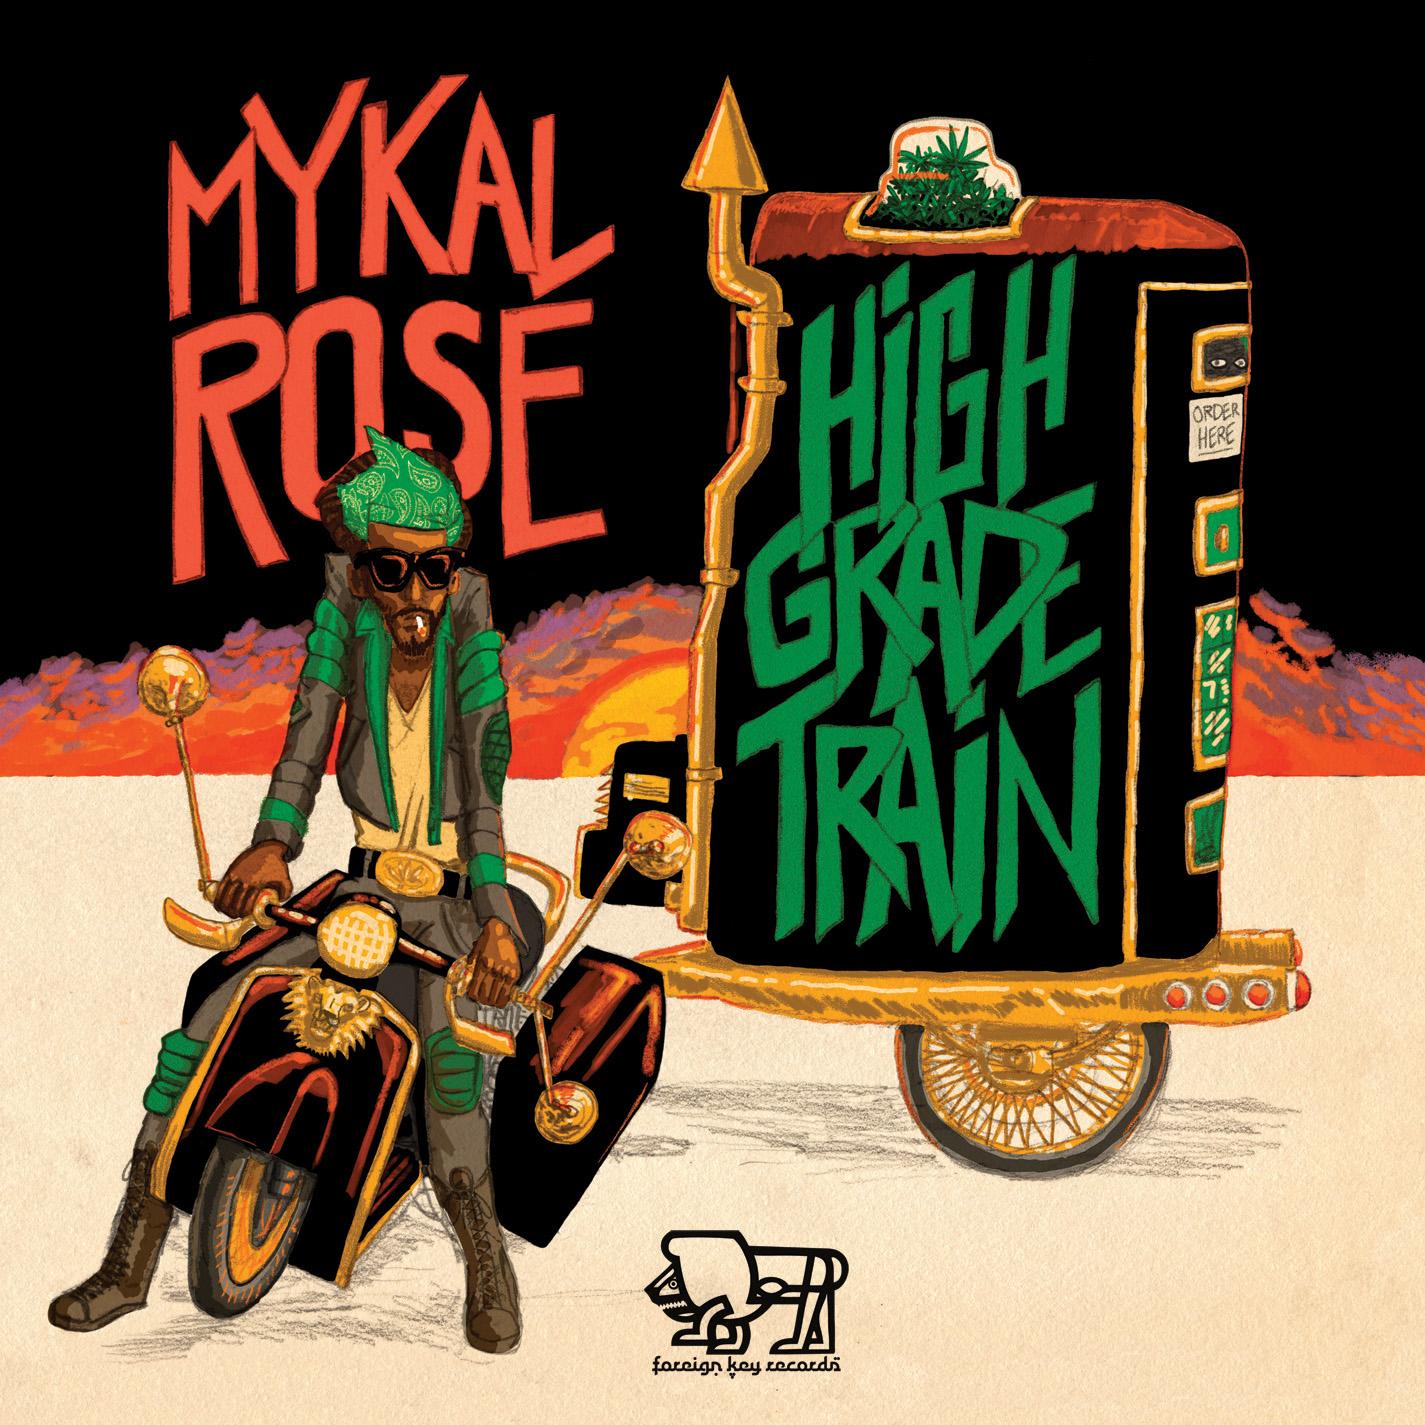 MykRose_HighGradeTrain__covercrop2.jpg